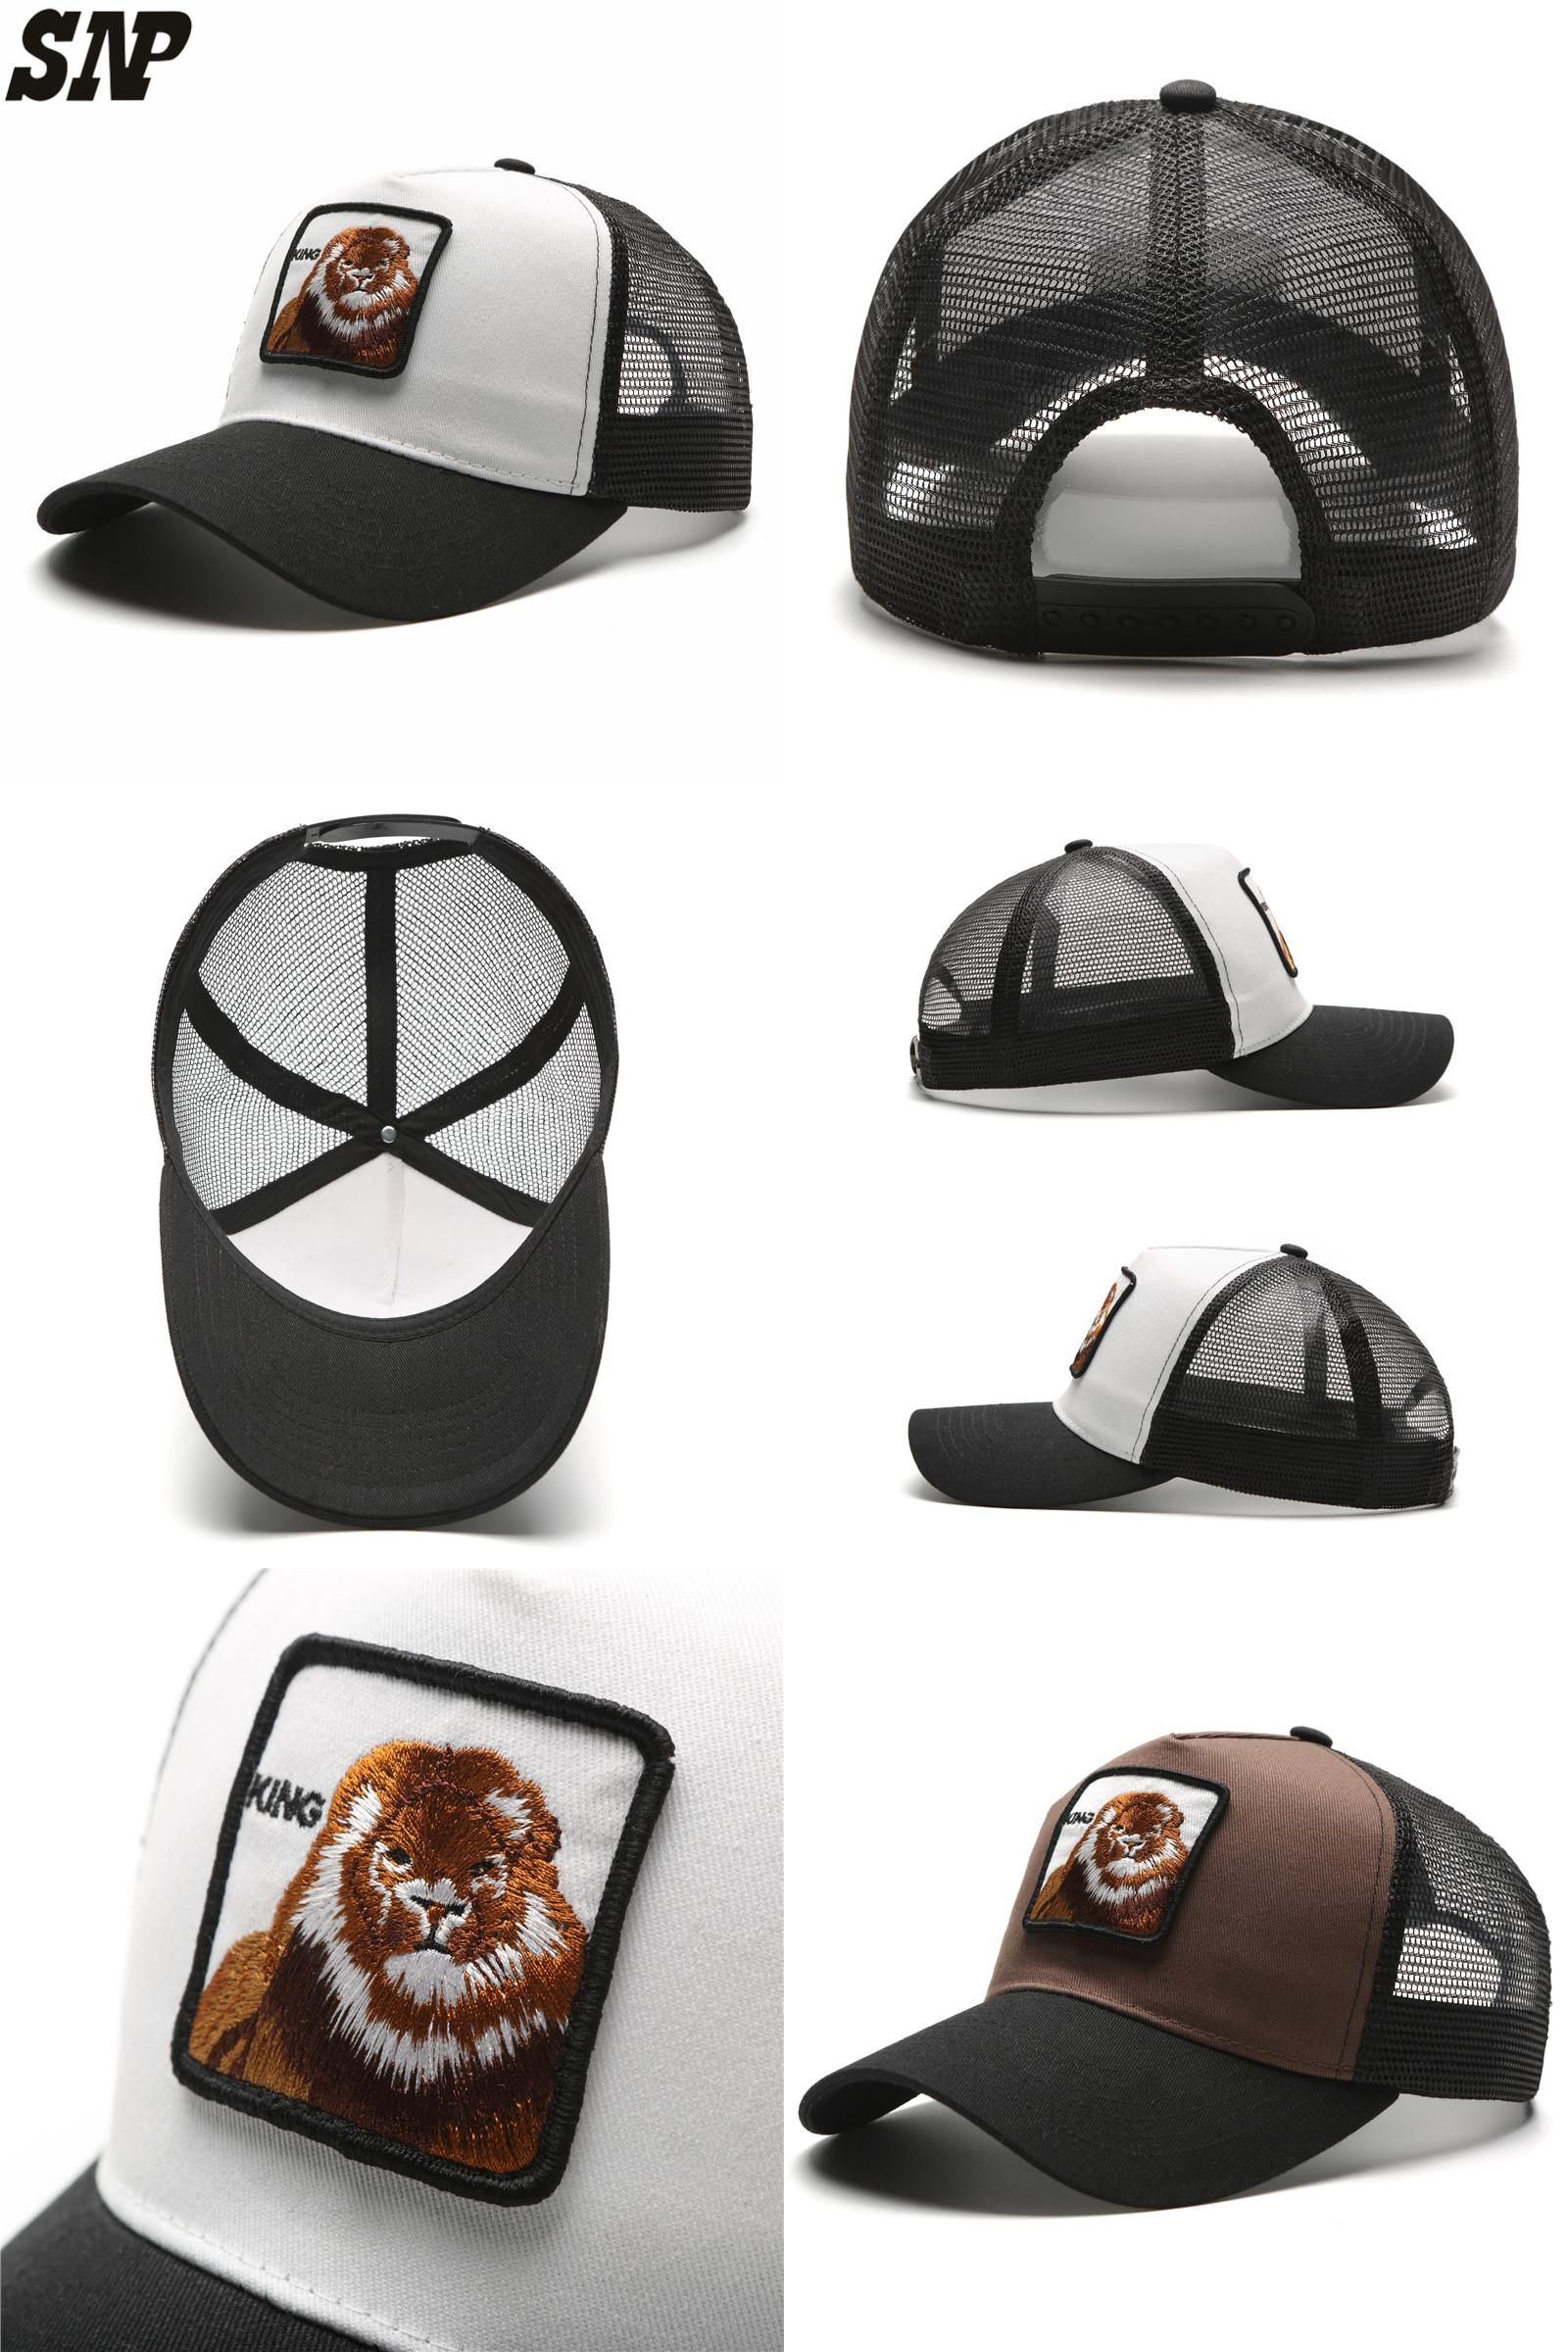 Visit to Buy  SNP snapback trucker mesh cap women baseball cap men summer  casquette 1d6f2fd0951